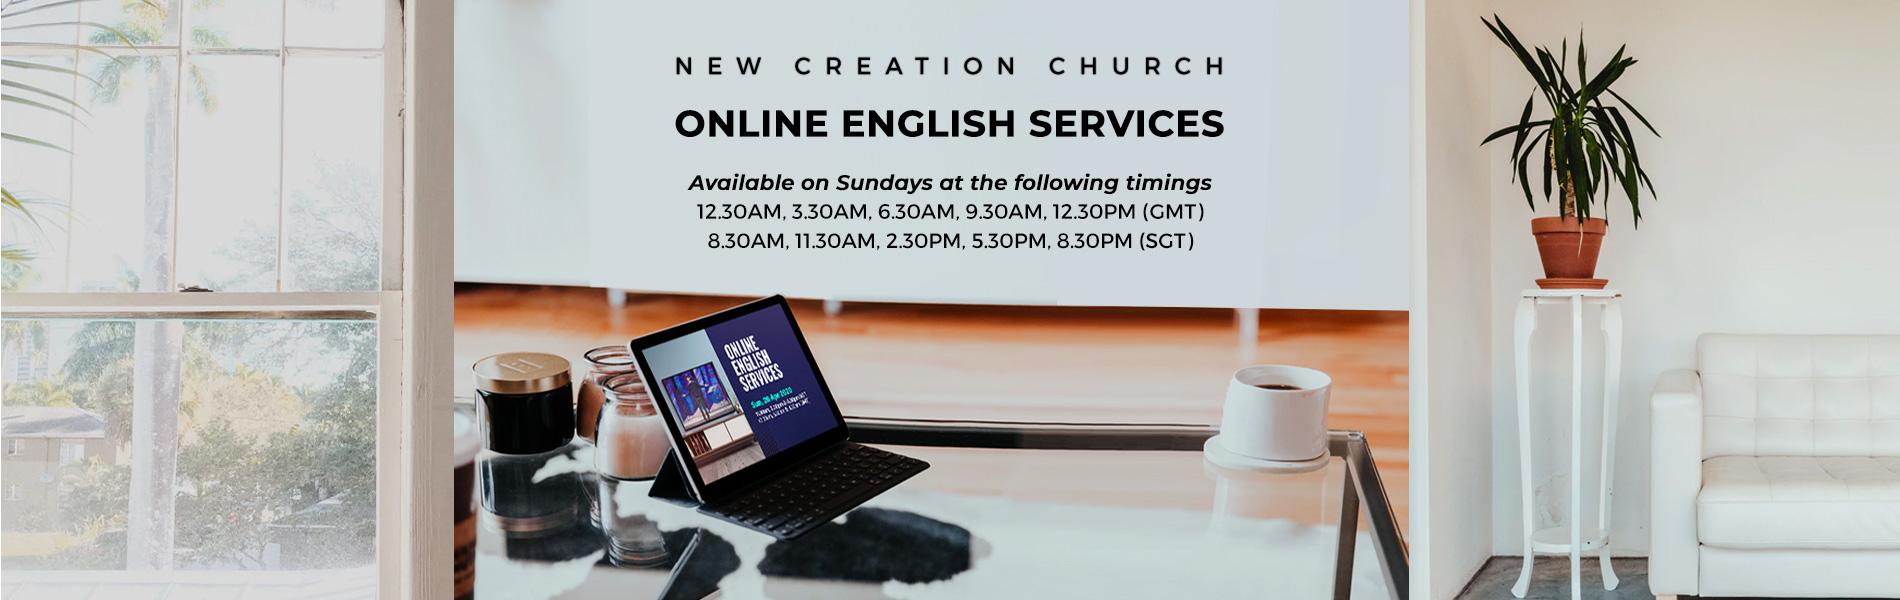 Online_church_31082020 New Creation TV | Broadcasting the Gospel of Jesus